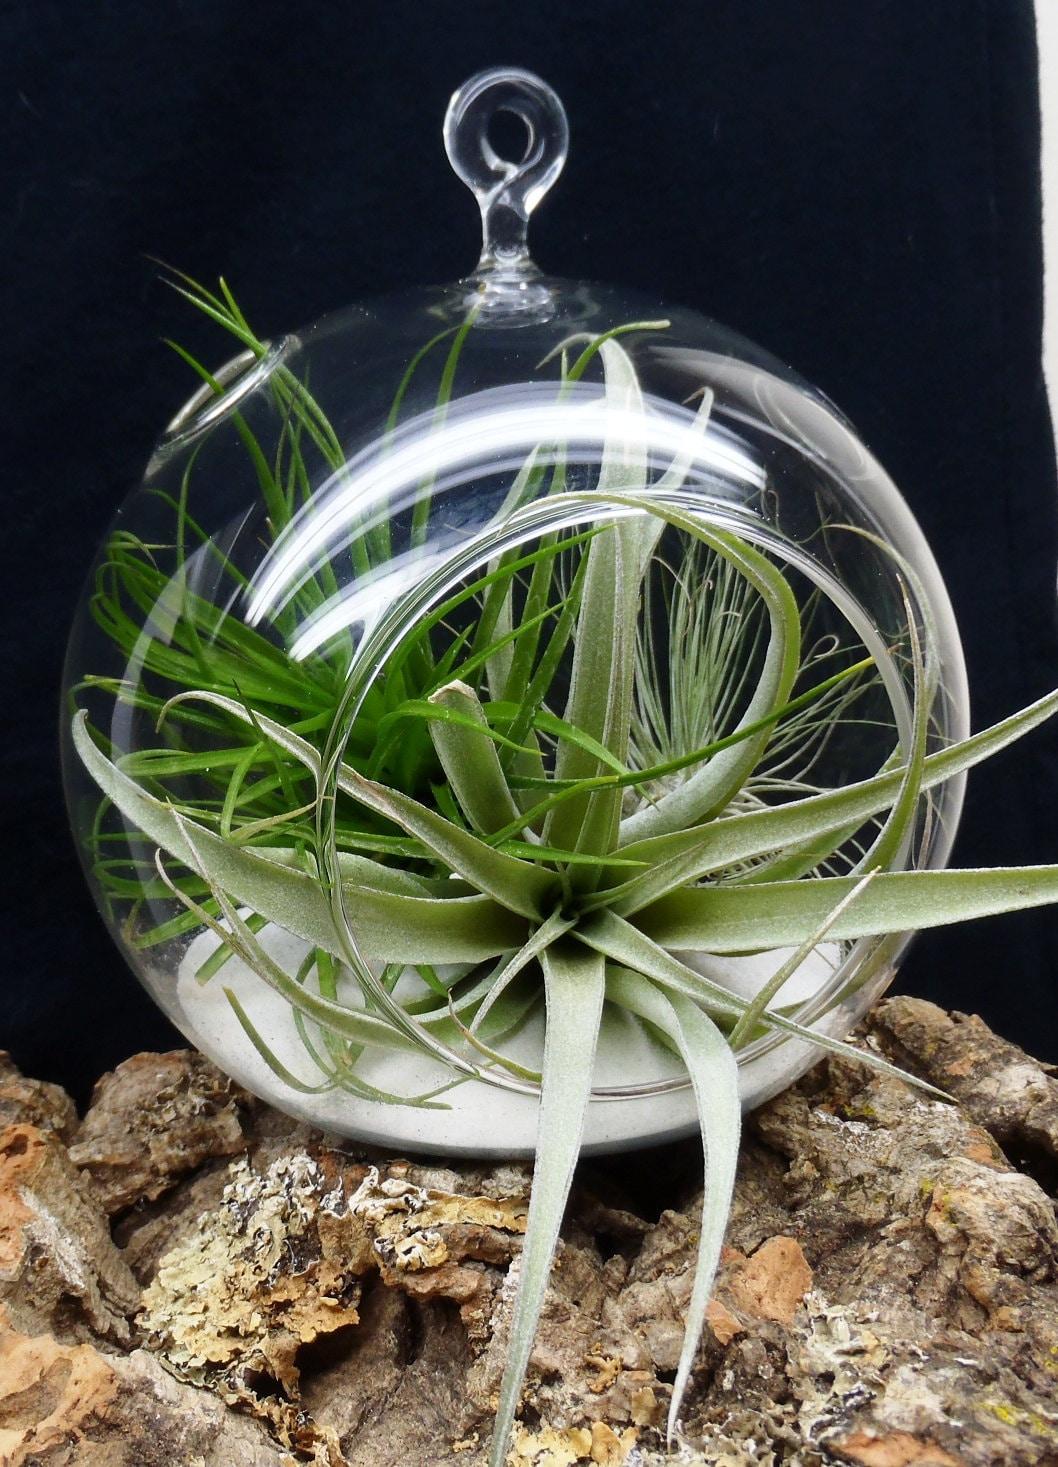 hanging air plant terrarium tillandsias in glass by plantzilla. Black Bedroom Furniture Sets. Home Design Ideas